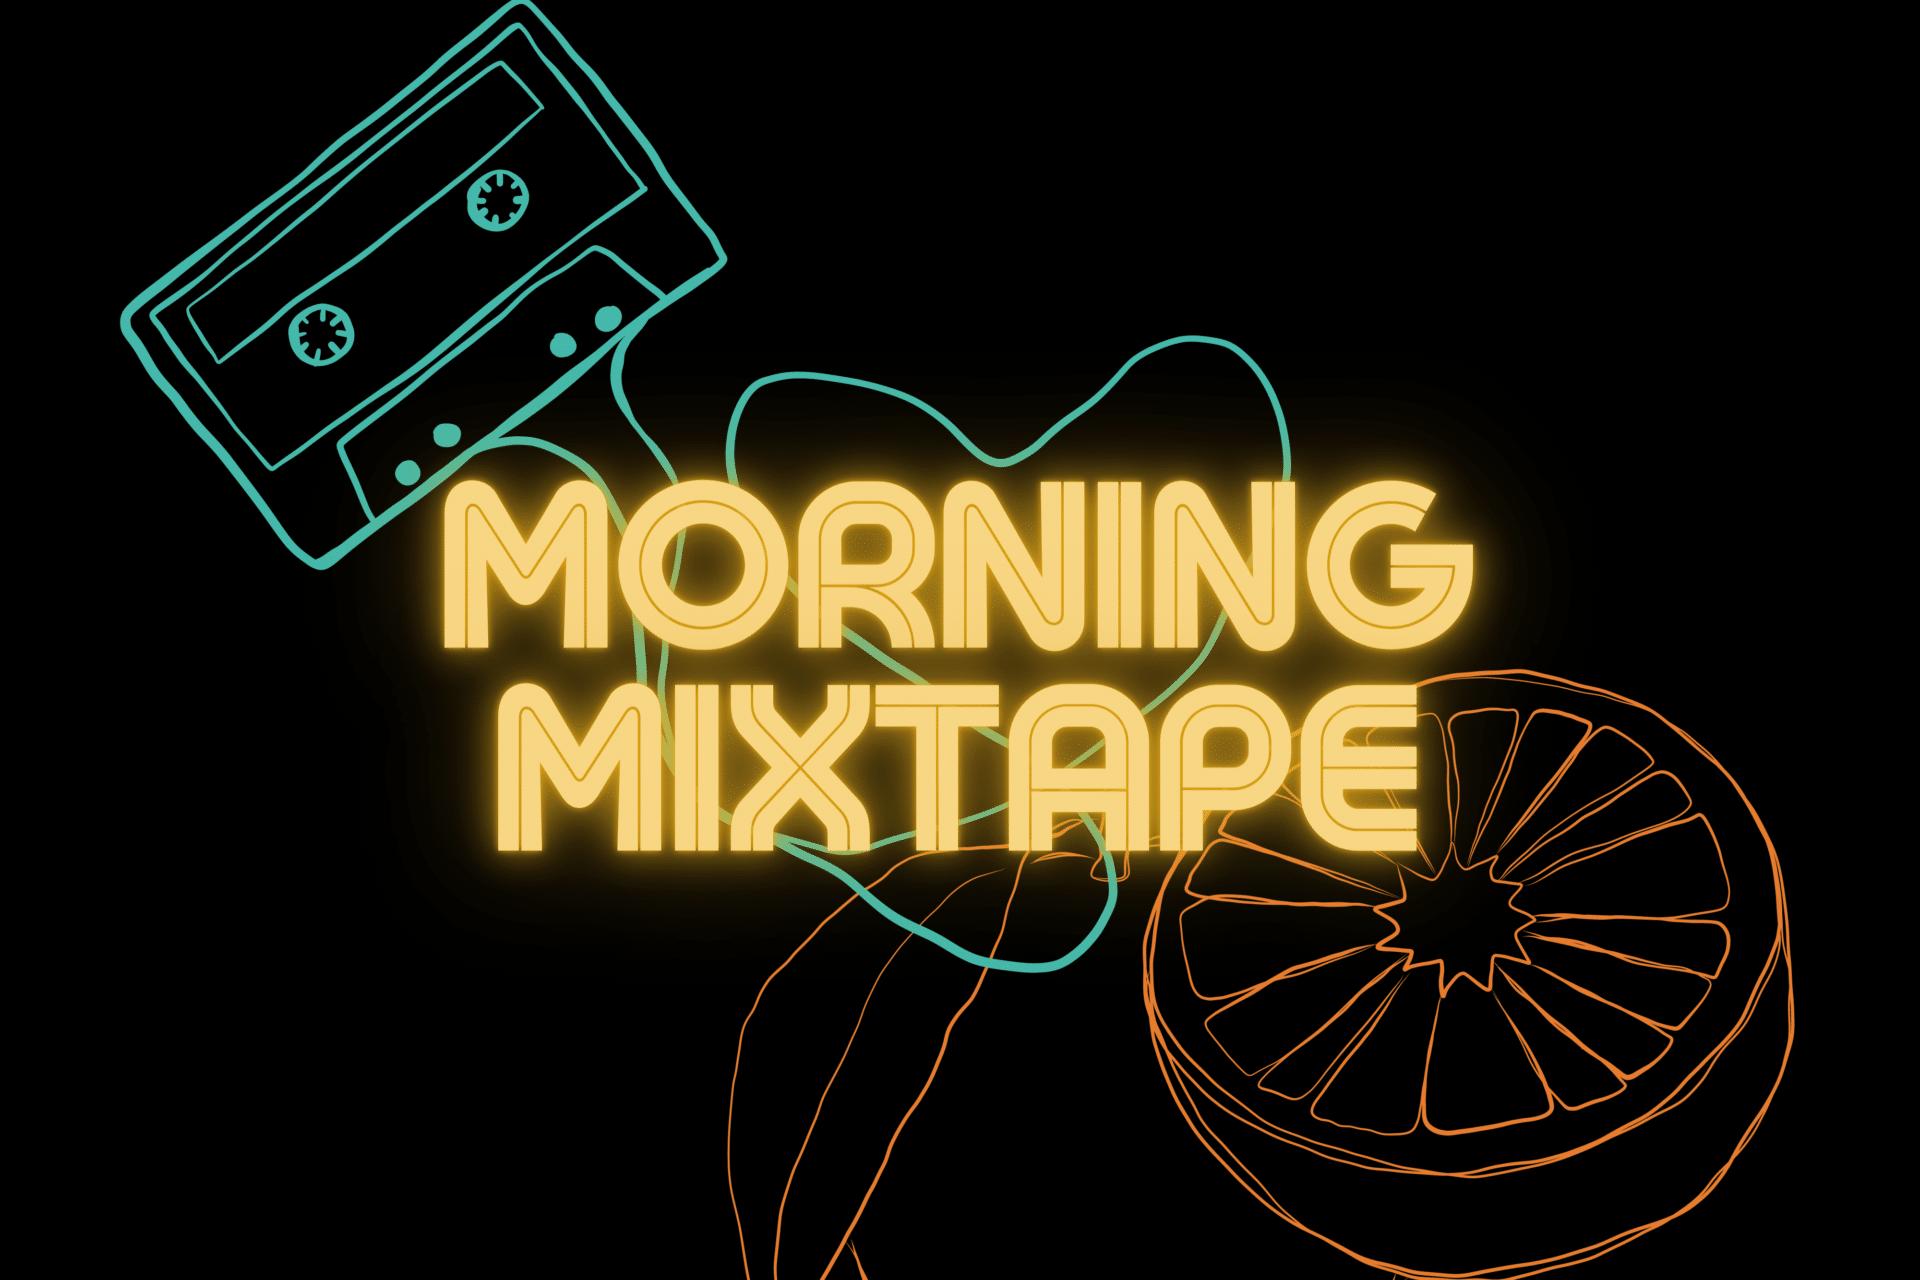 Morning Mixtape show image